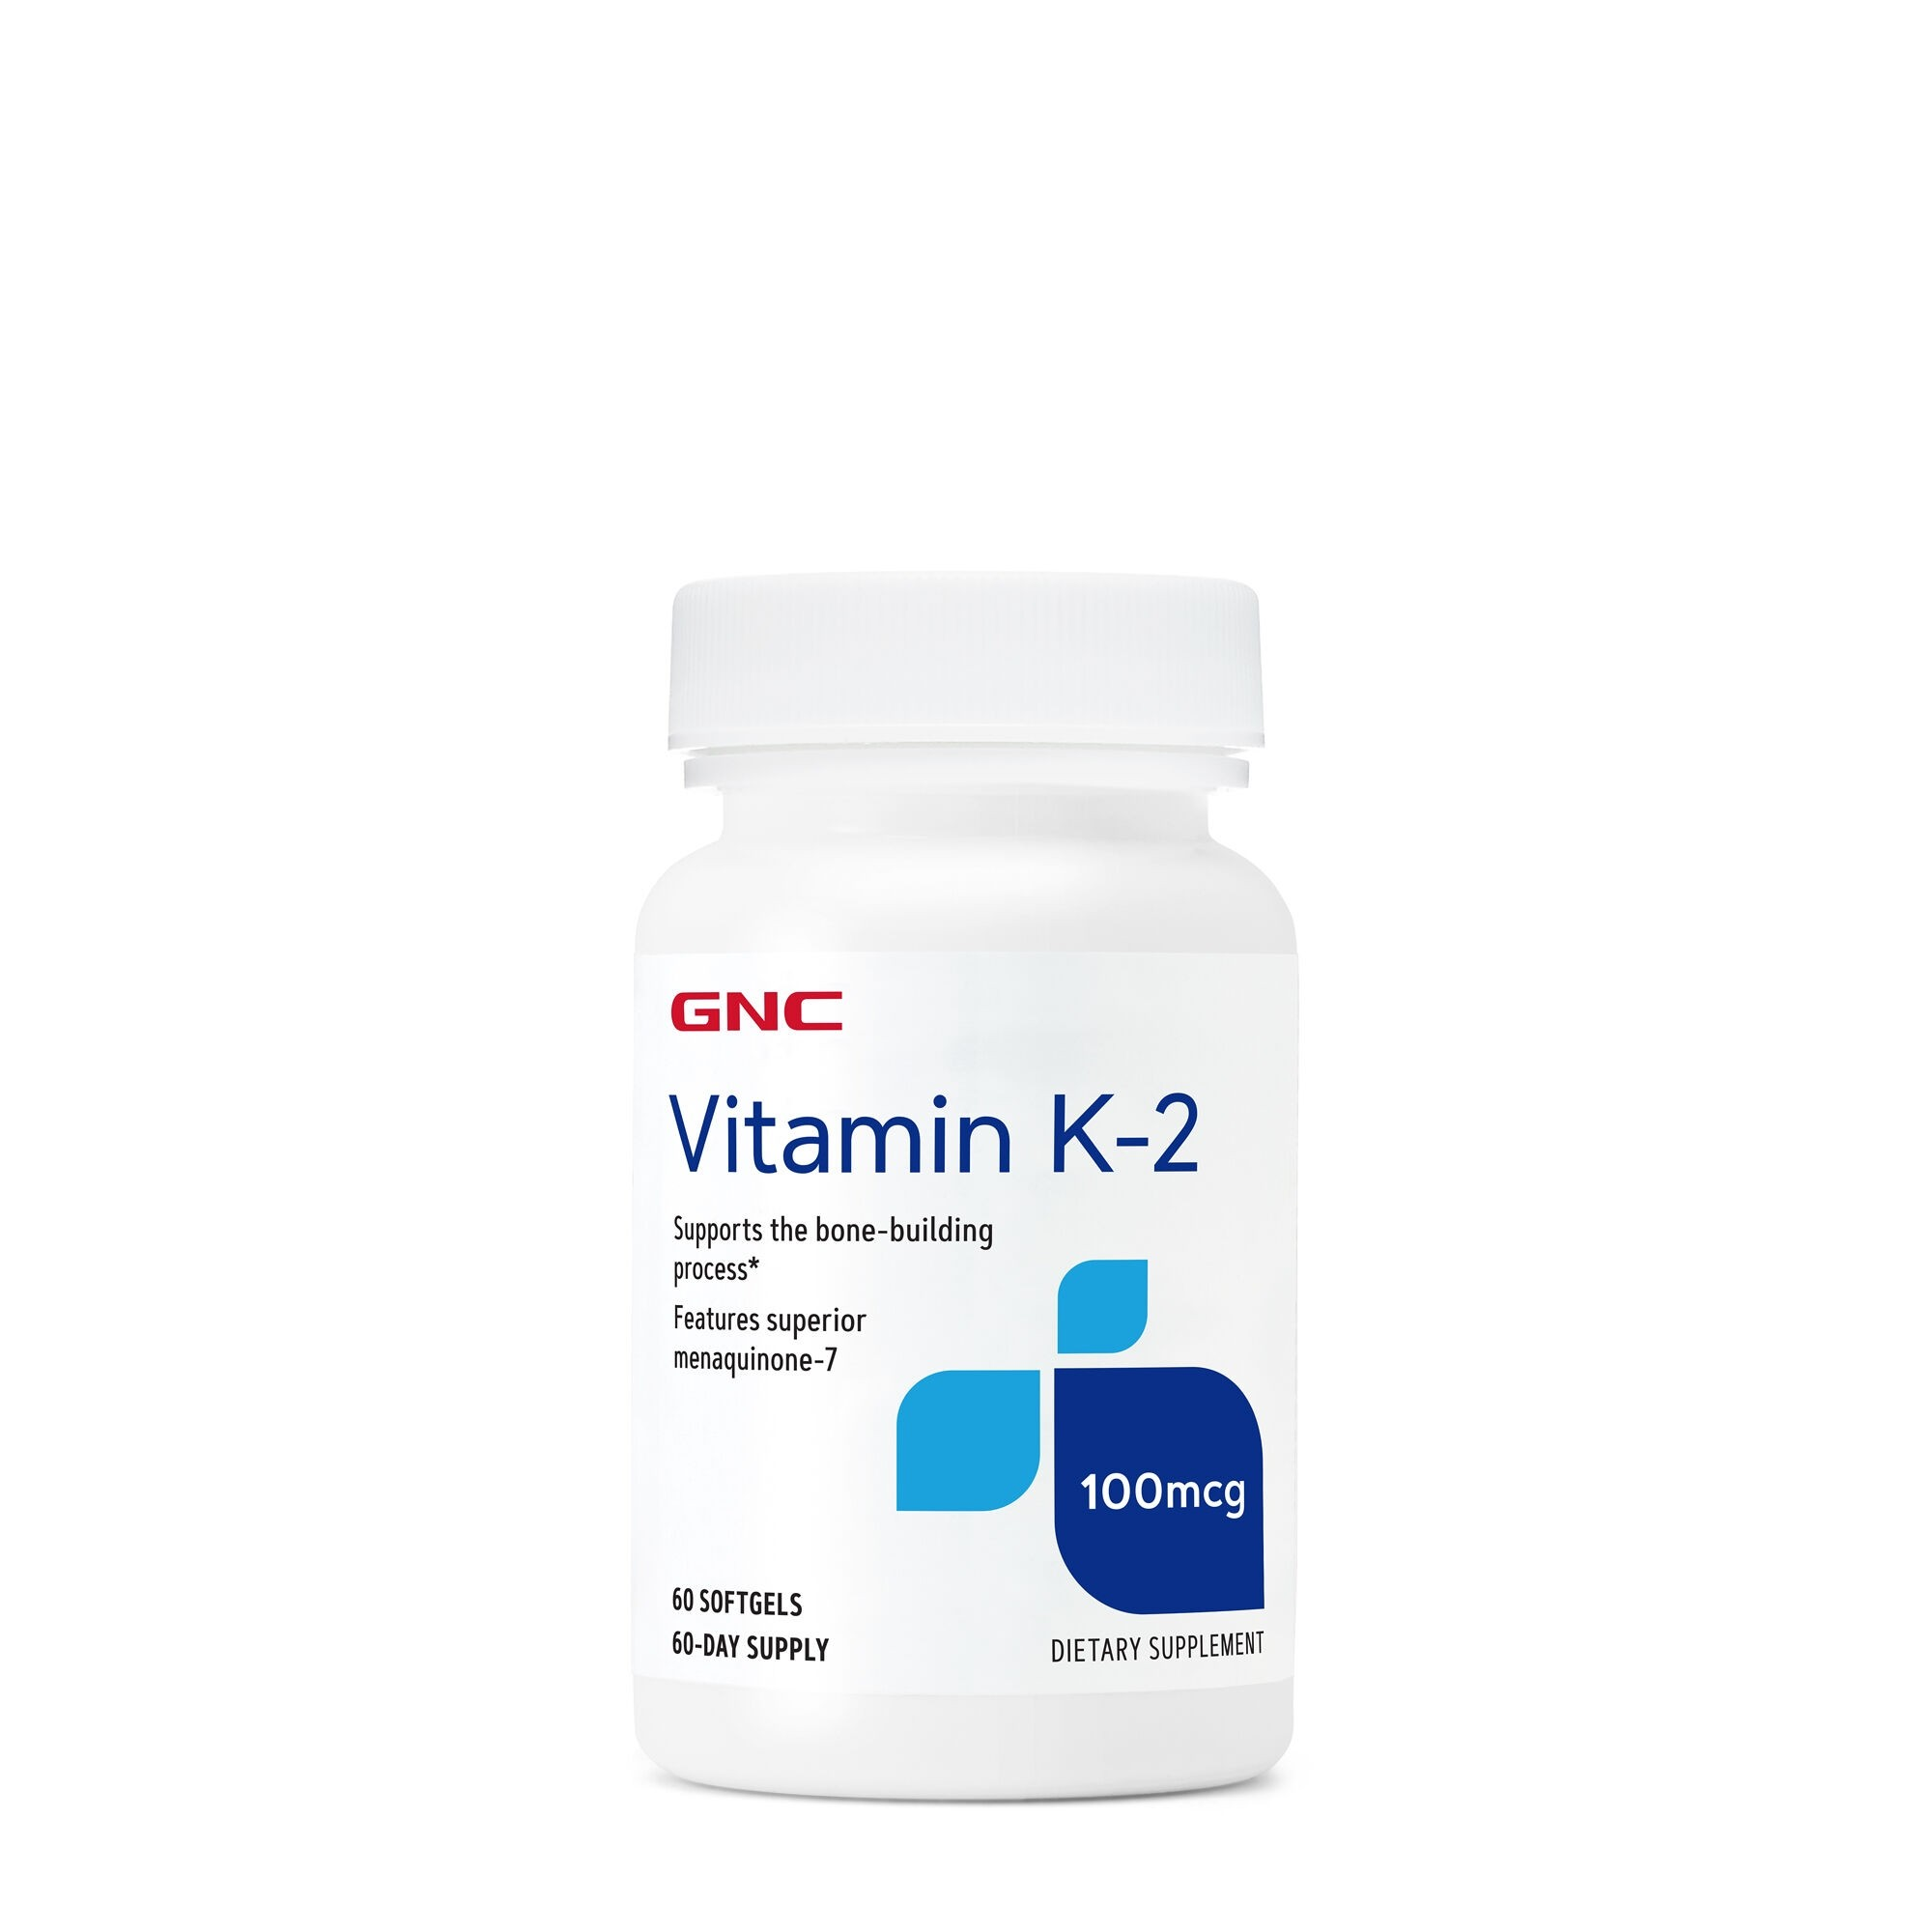 GNC Vitamin K-2 100 mcg, Vitamina K 2, 60 cps